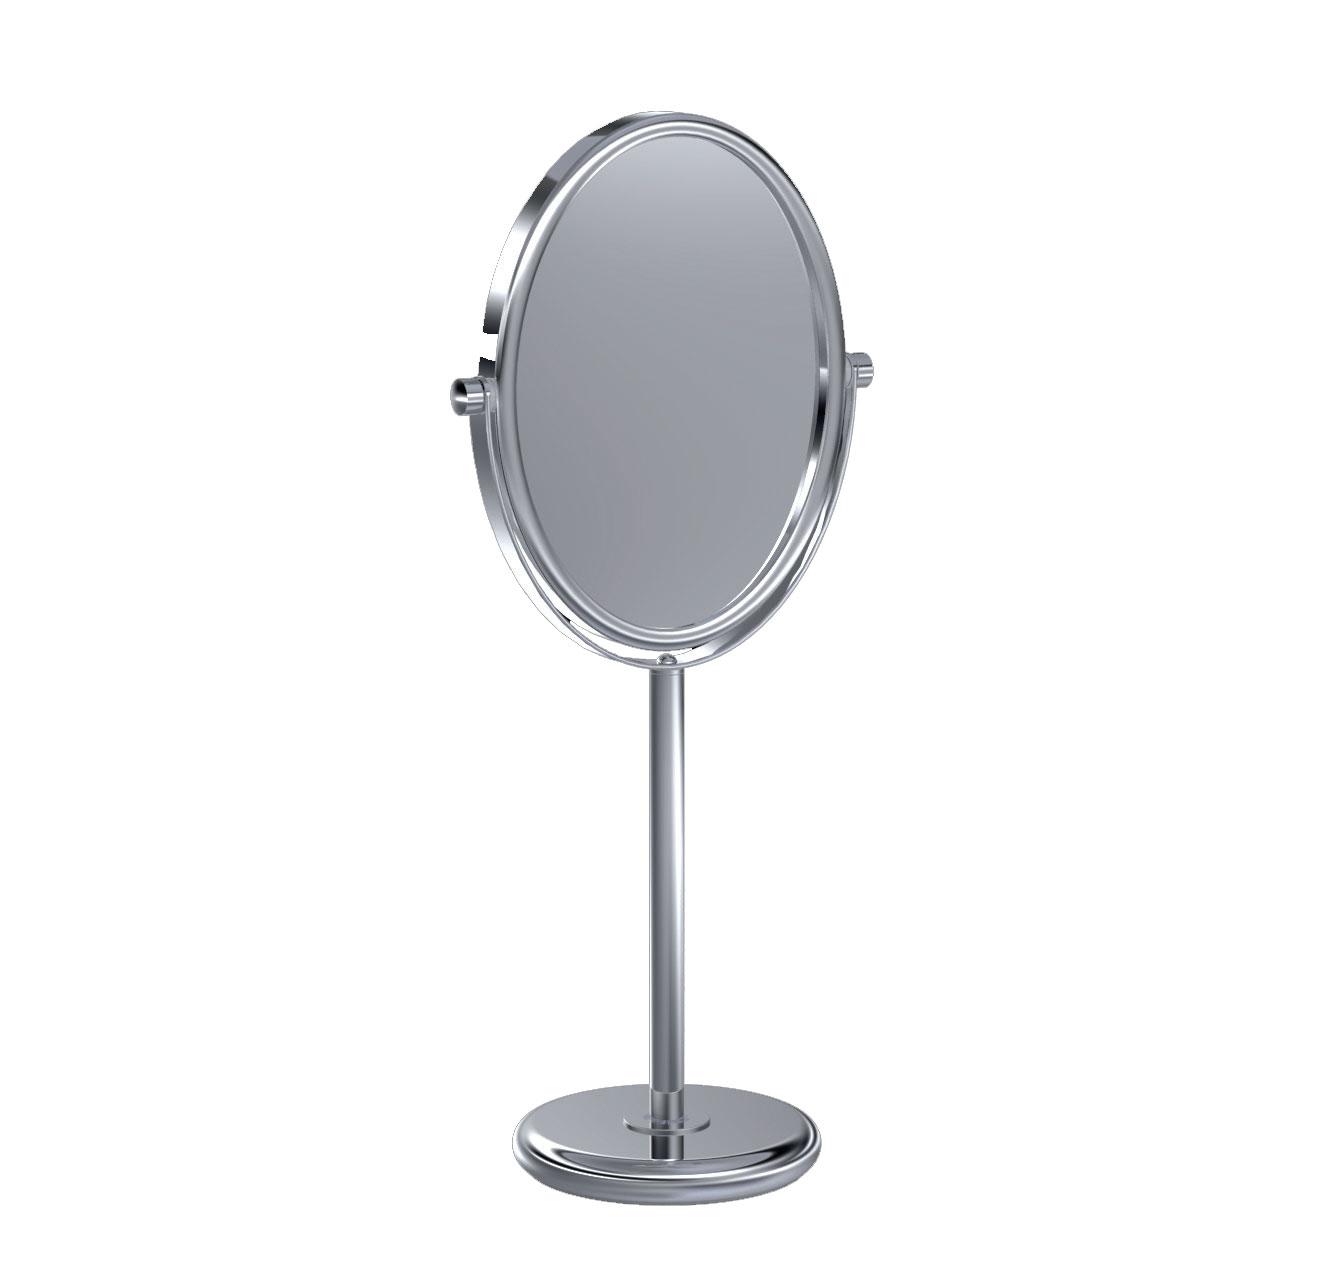 Baci Basic Large Oval Vanity Mirror By Remcraft Lighting M14 Sn